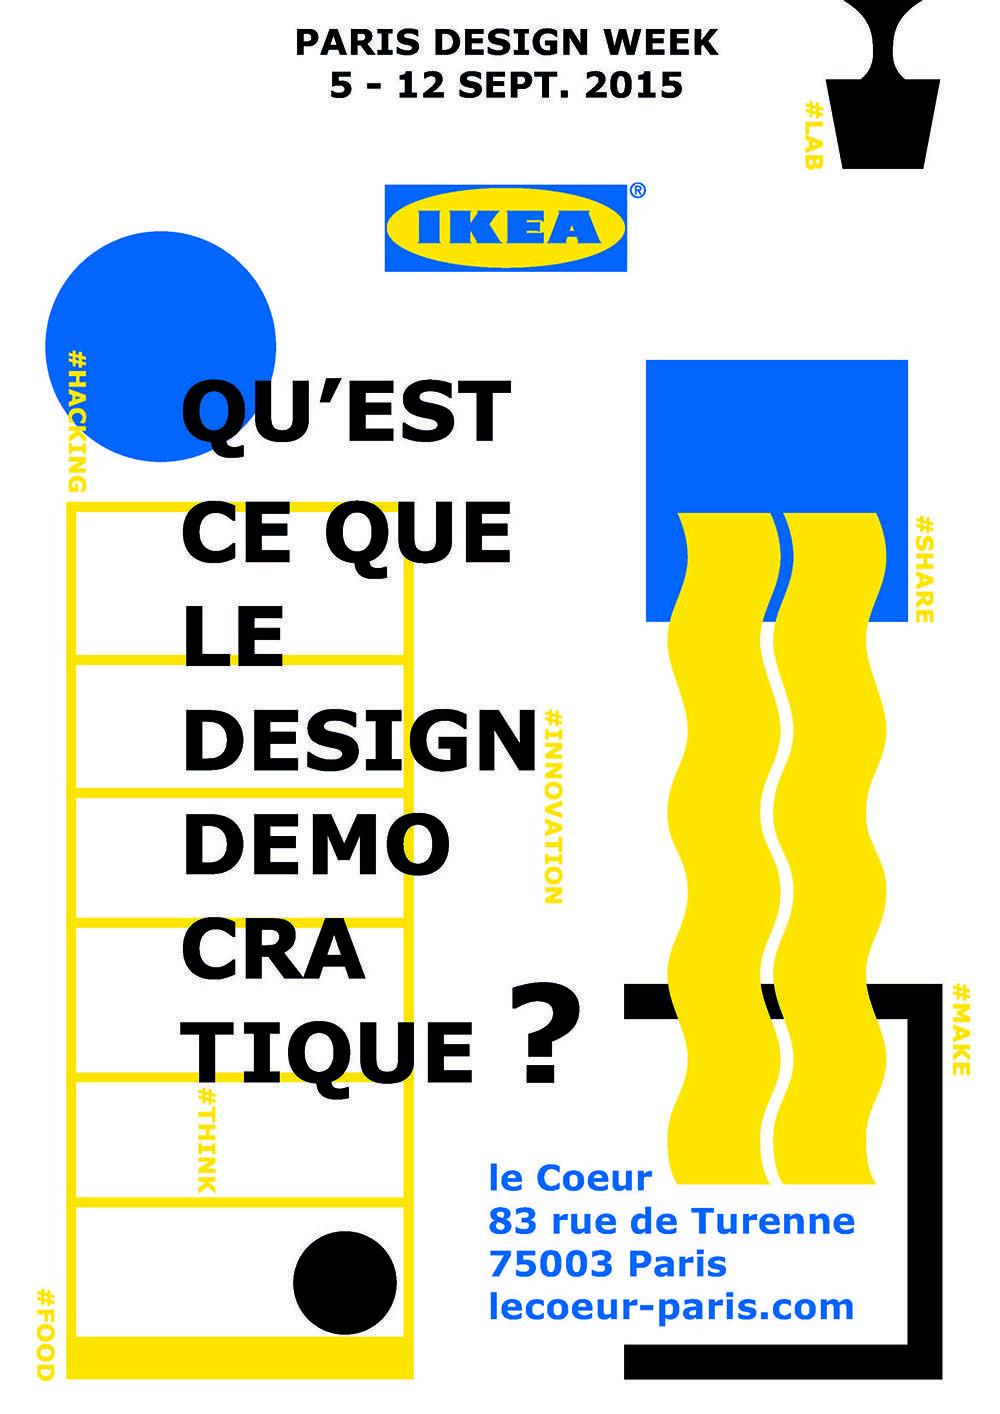 PDW IKEA_AFFICHE